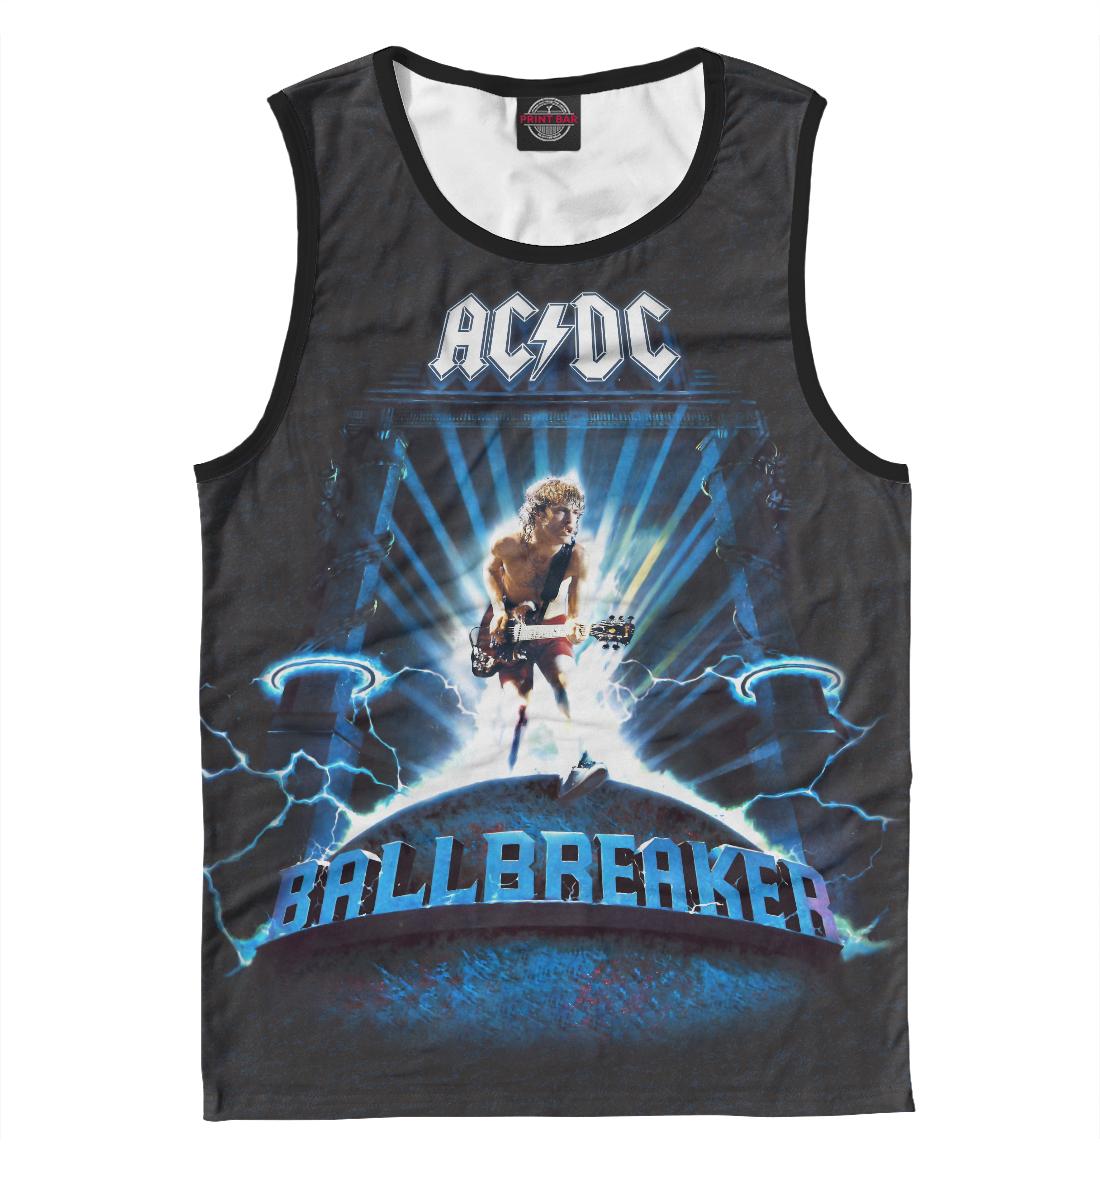 Купить ACDC Ballbreaker, Printbar, Майки, ACD-772161-may-2